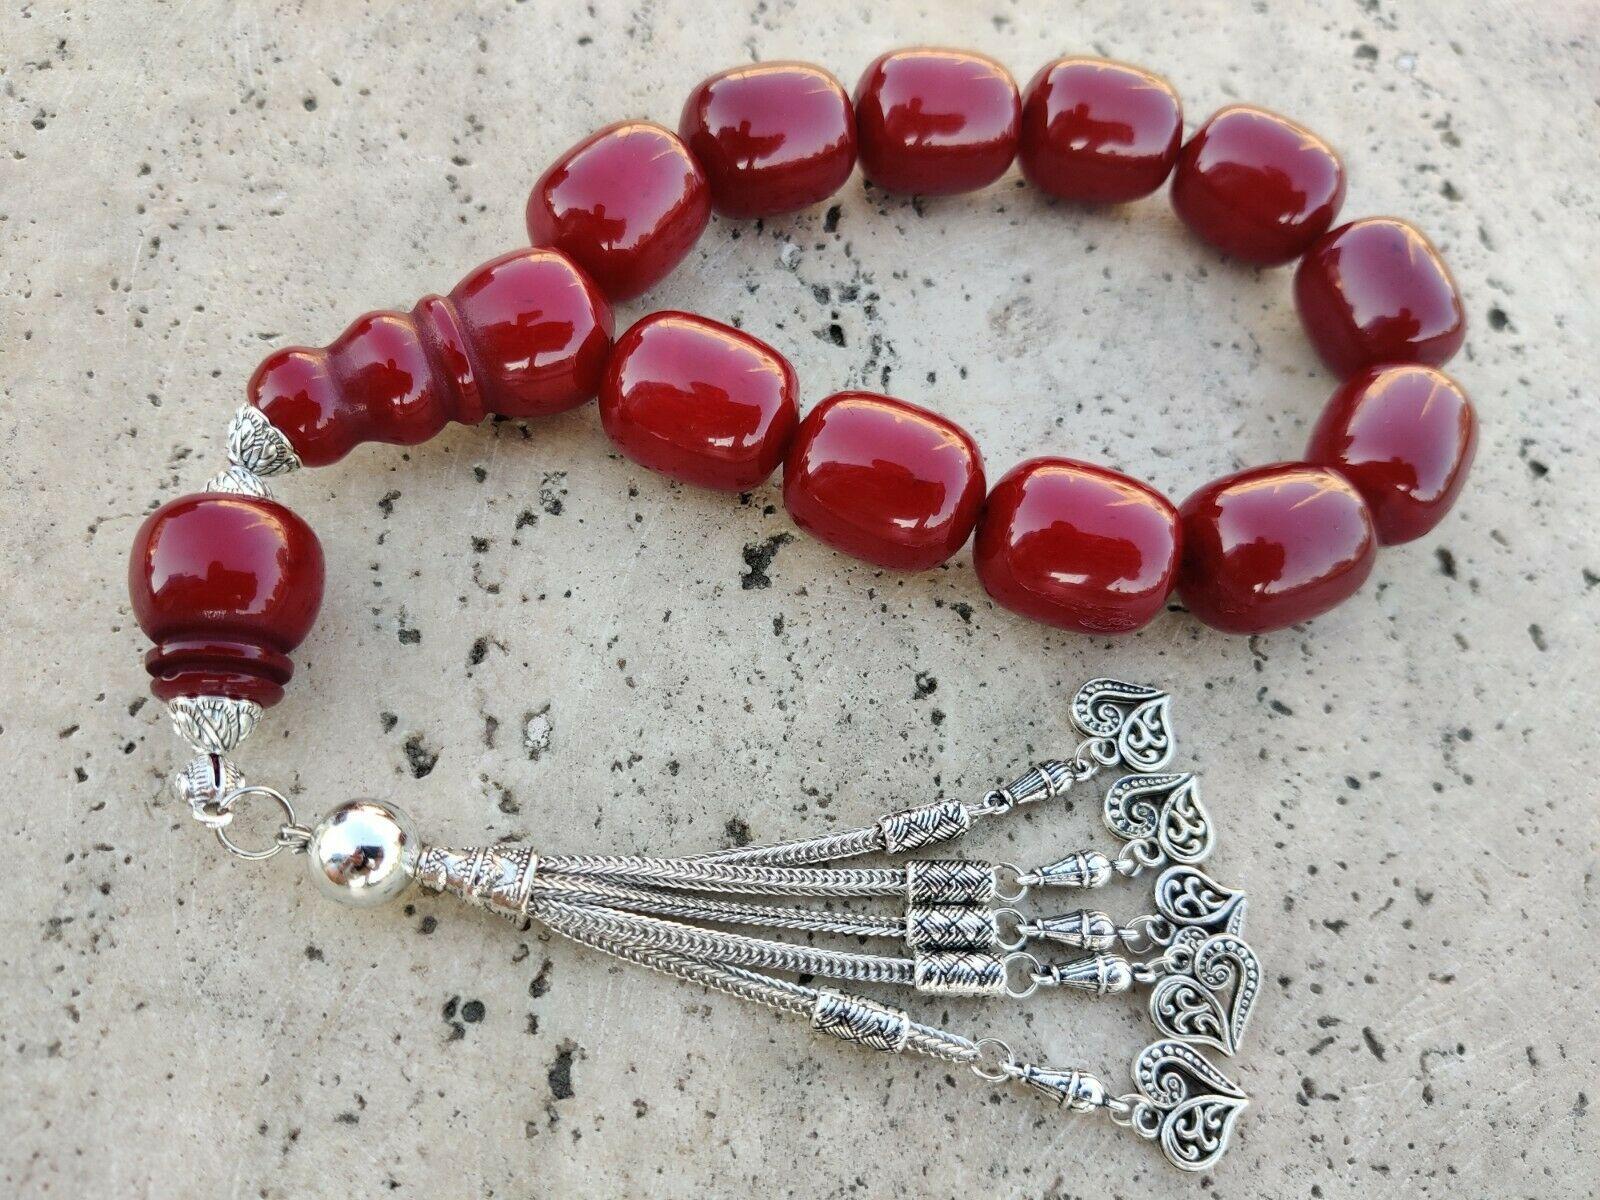 Ottoman Faturan German Amber Sandalous Misbaha Prayer Beads Islamic Gift Tasbih Tasbeeh Tasbeh Rosary Tasbih # 26C